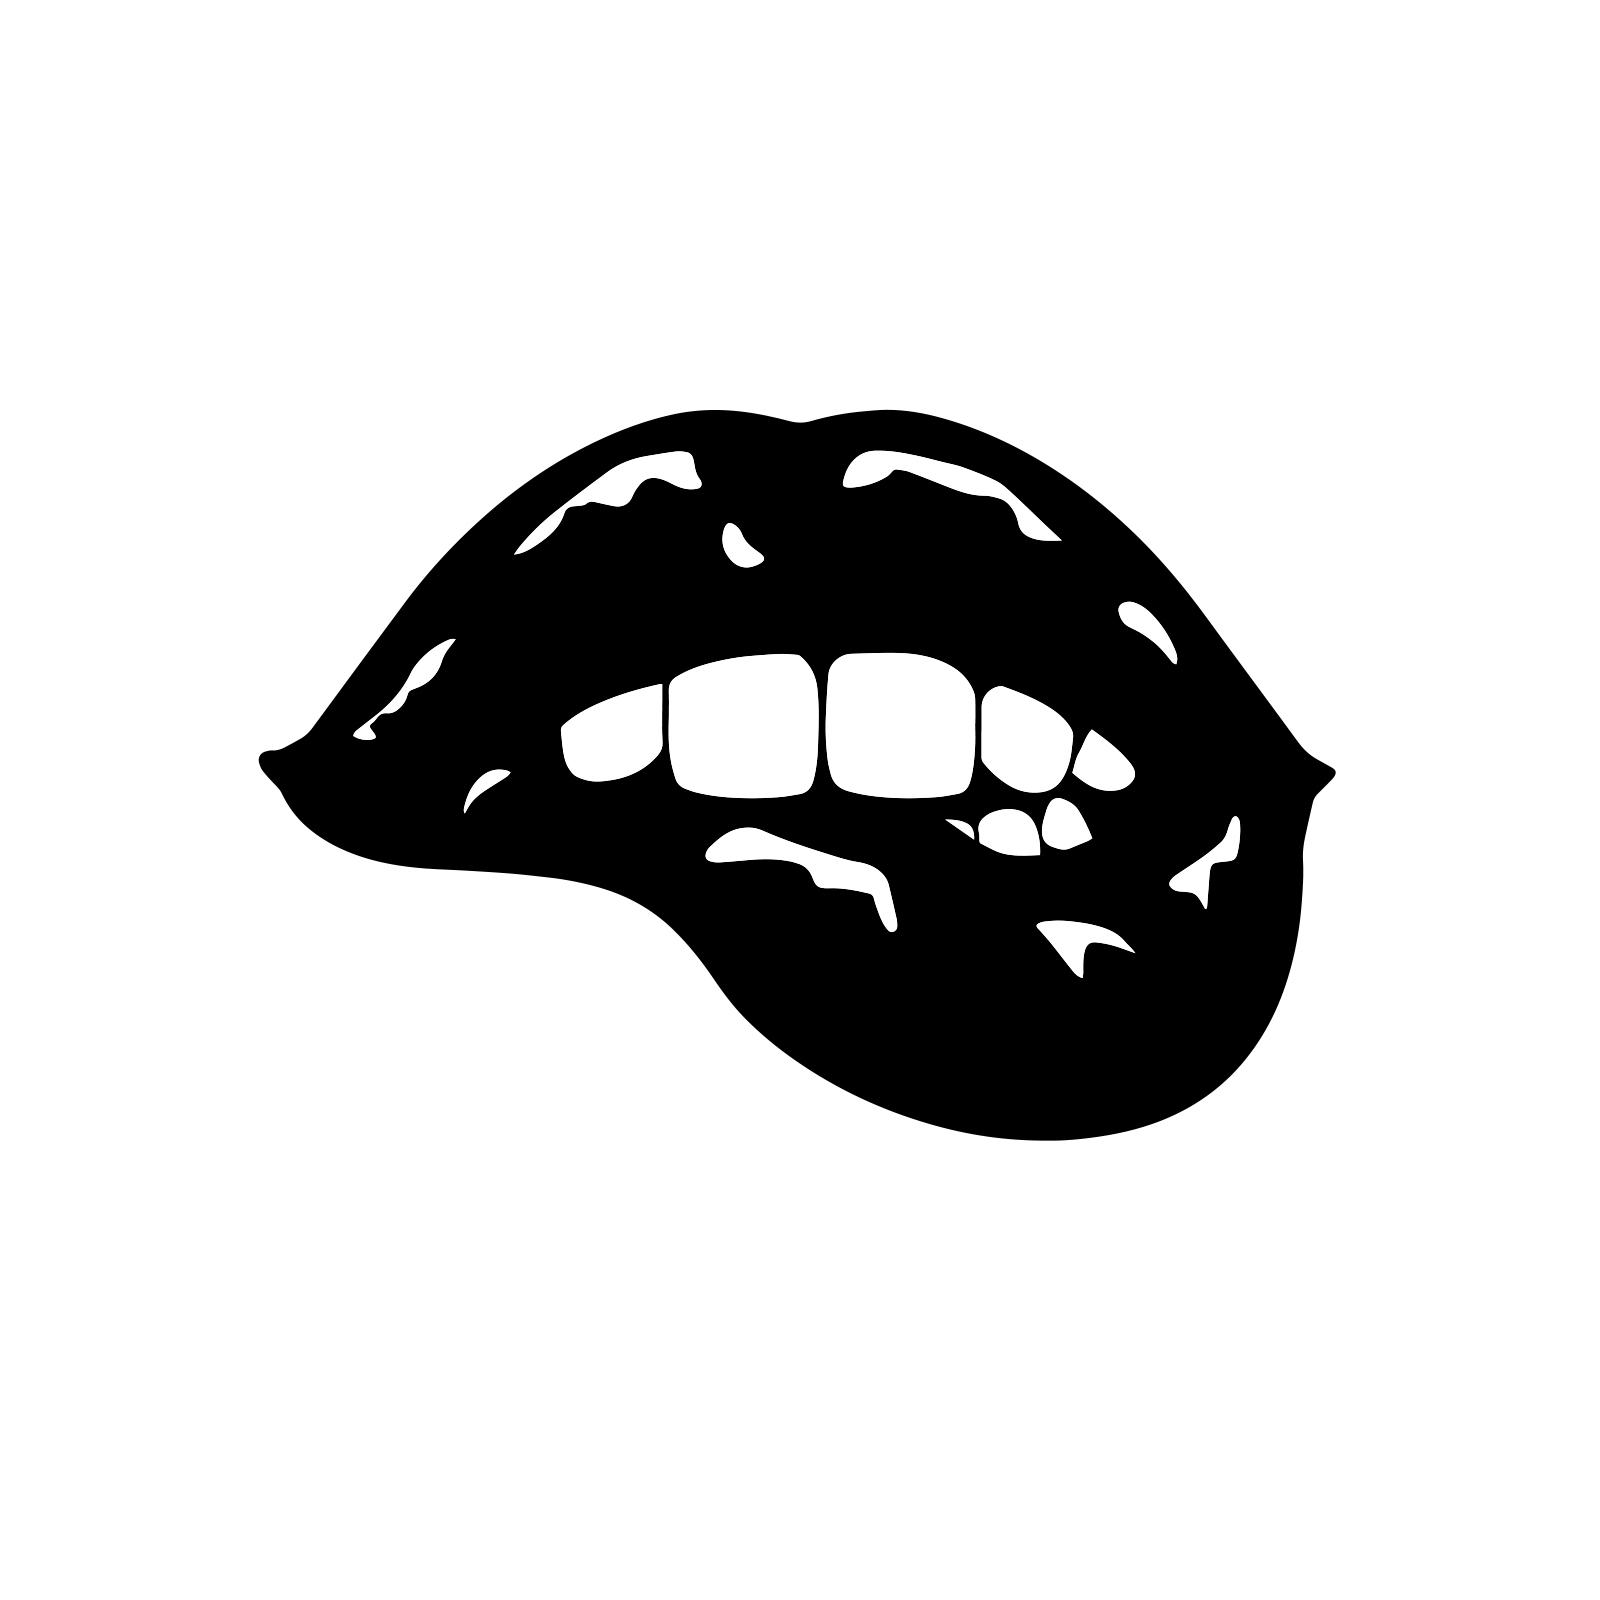 Biting Lip Snowboard Sticker All Weather Vinyl Decal